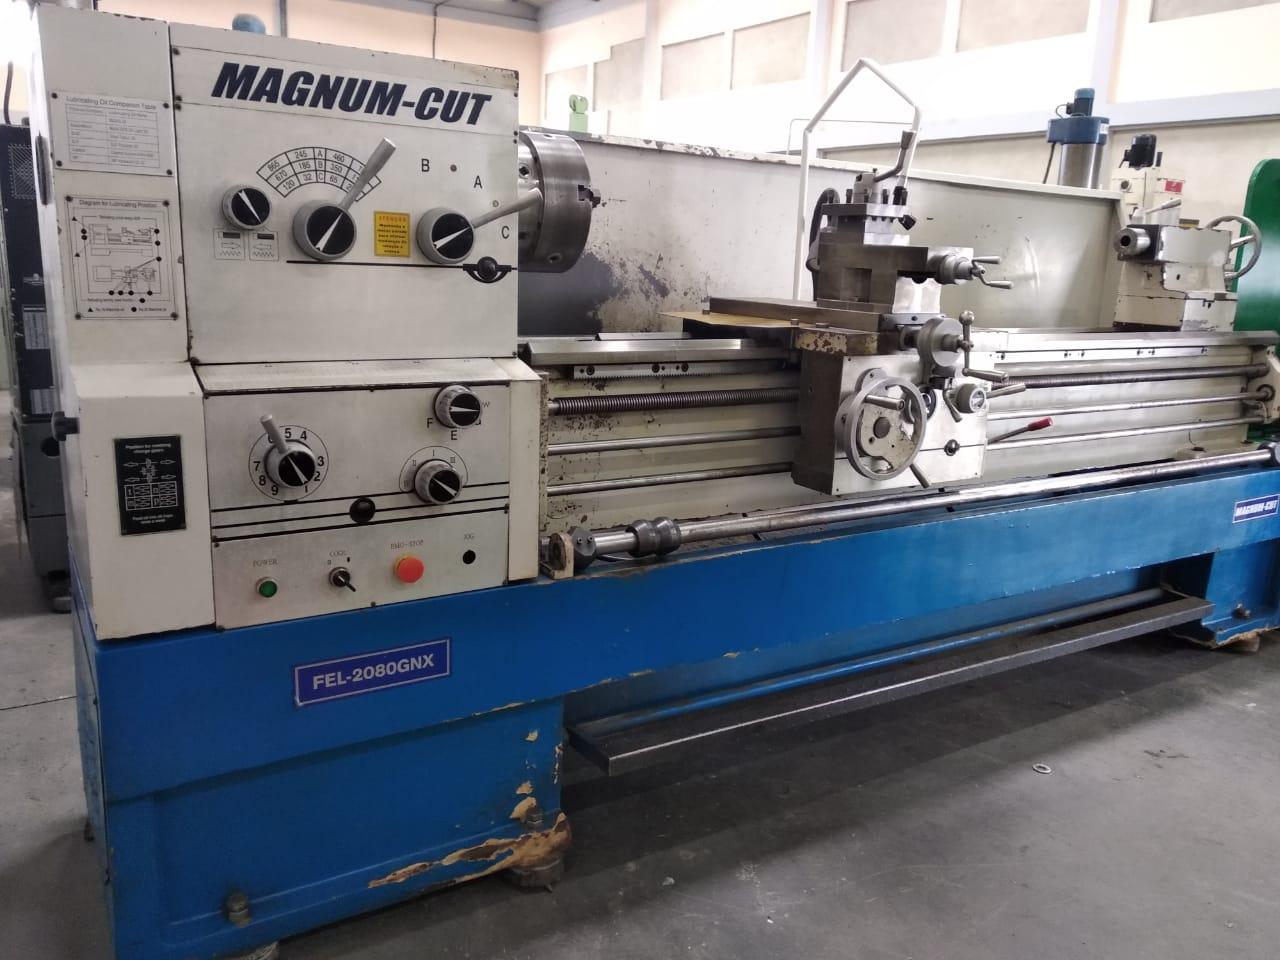 Torno Mecânico, marca Magnum Cut, modelo FEL 2080 GNX | Vision Mach Equipamentos